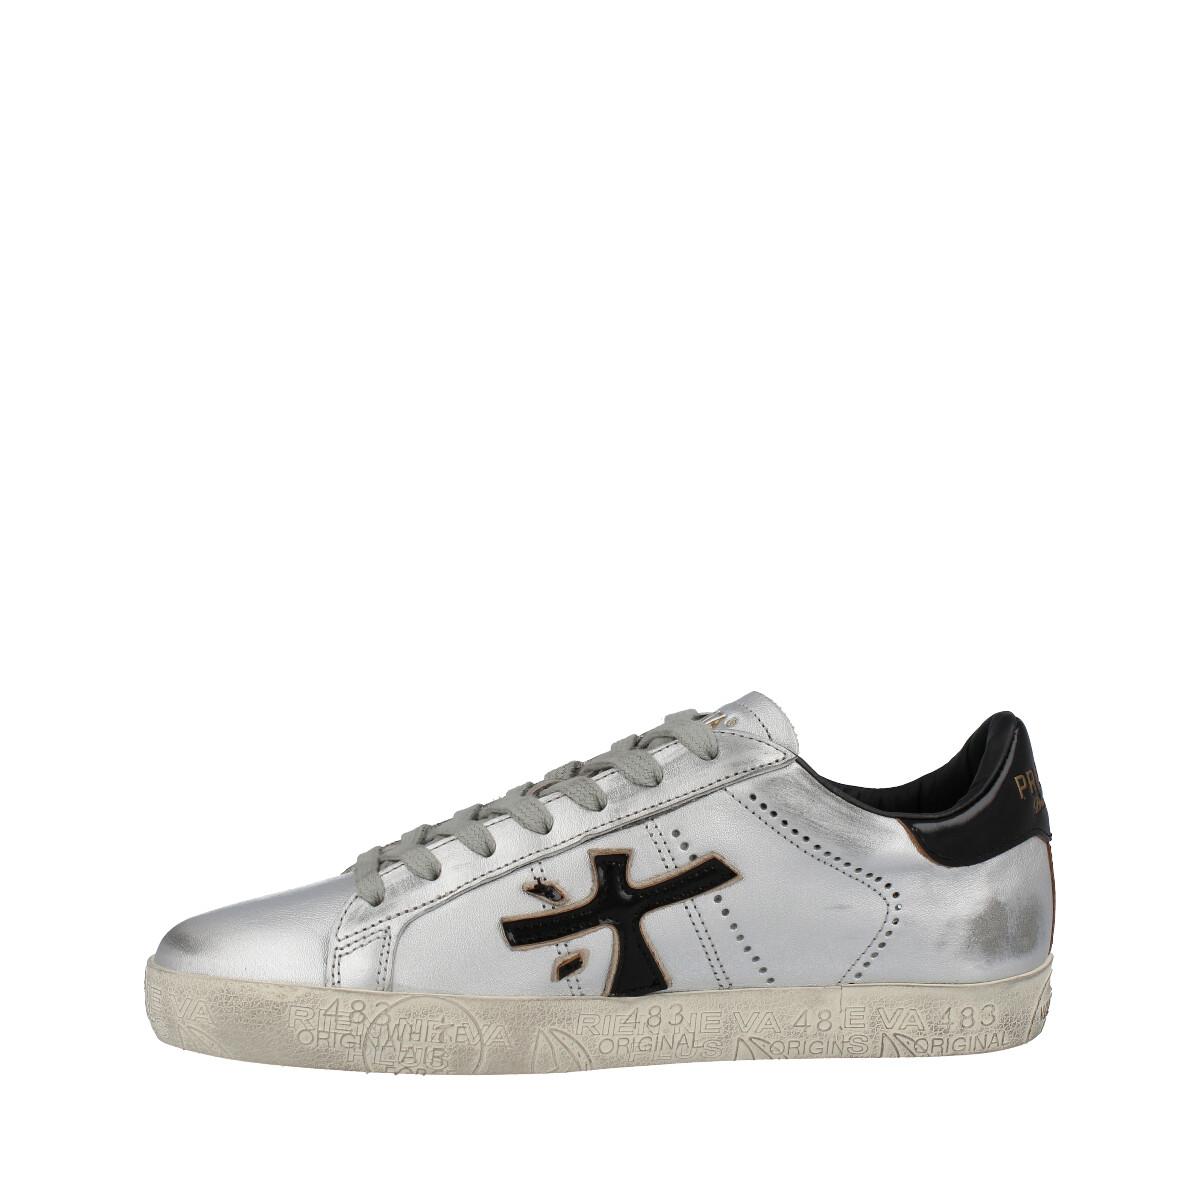 Sneaker Paterson Beig